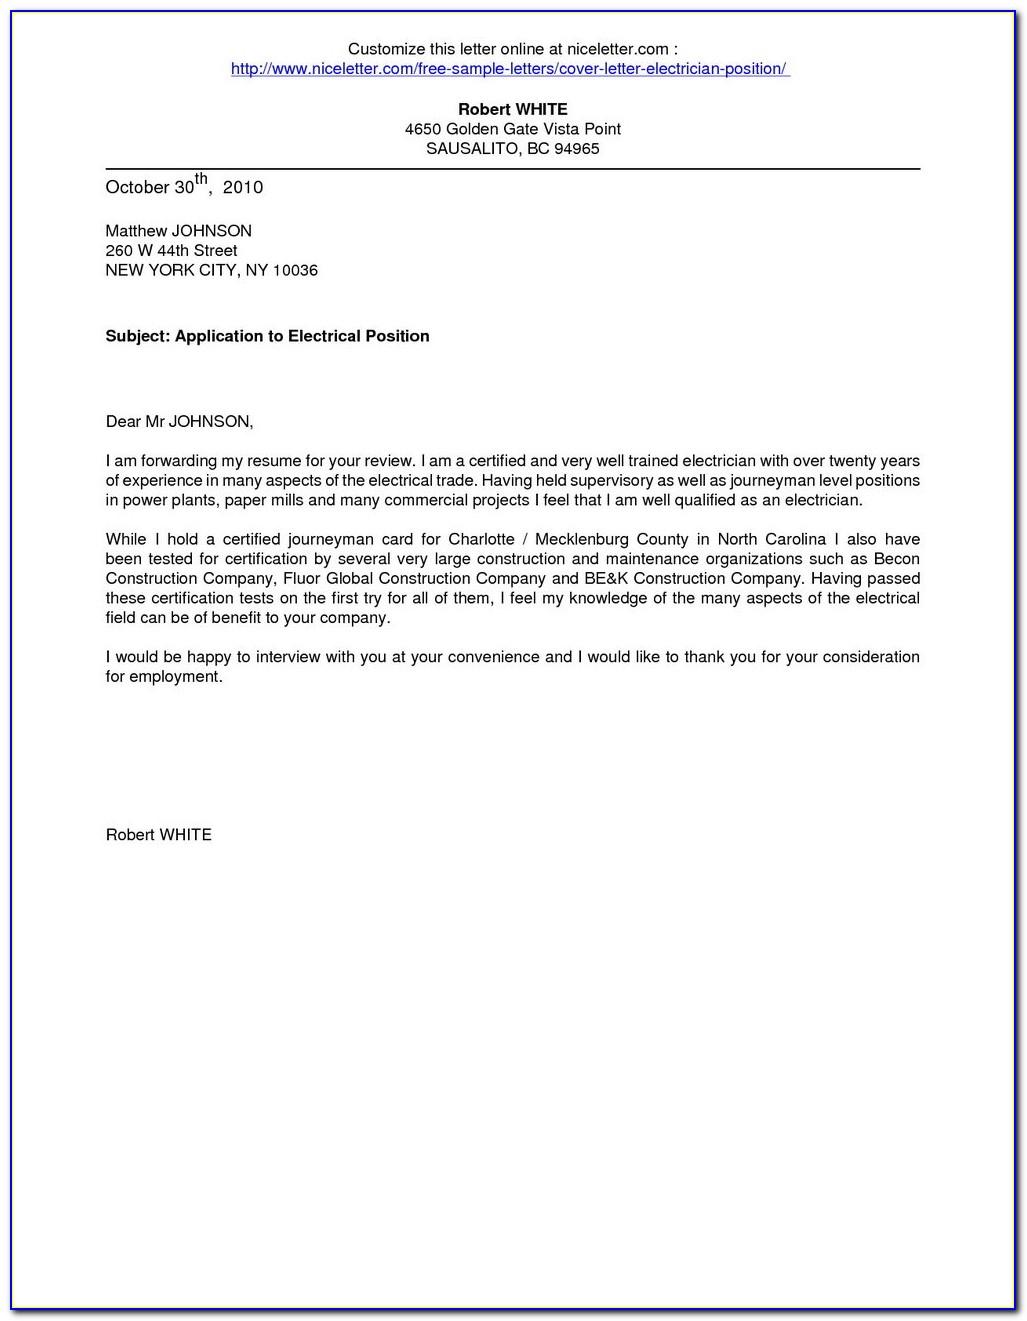 State Farm Job Application Form